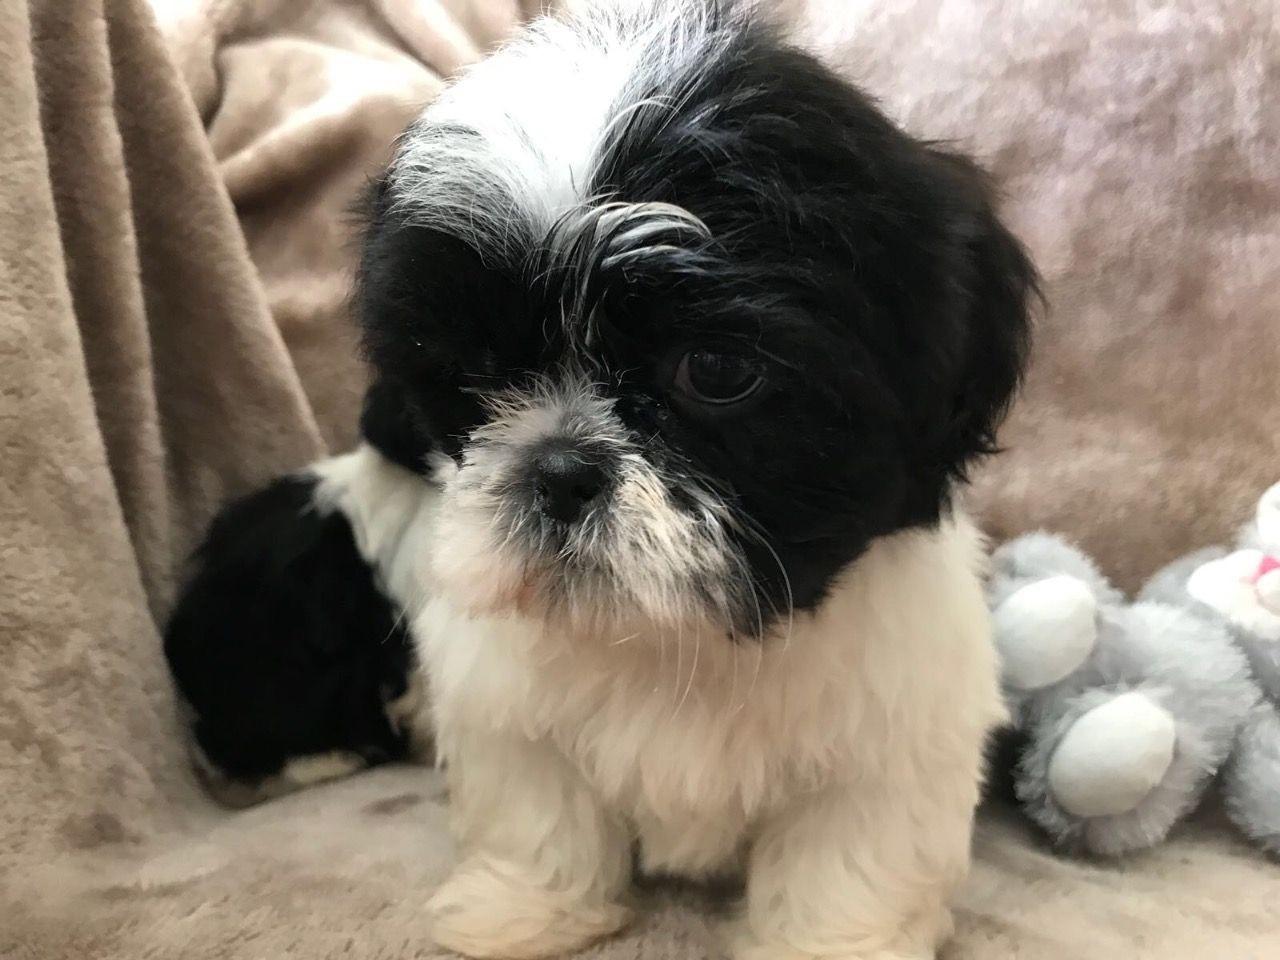 Shih Tzu Puppies For Sale Houston Tx 280032 Petzlover